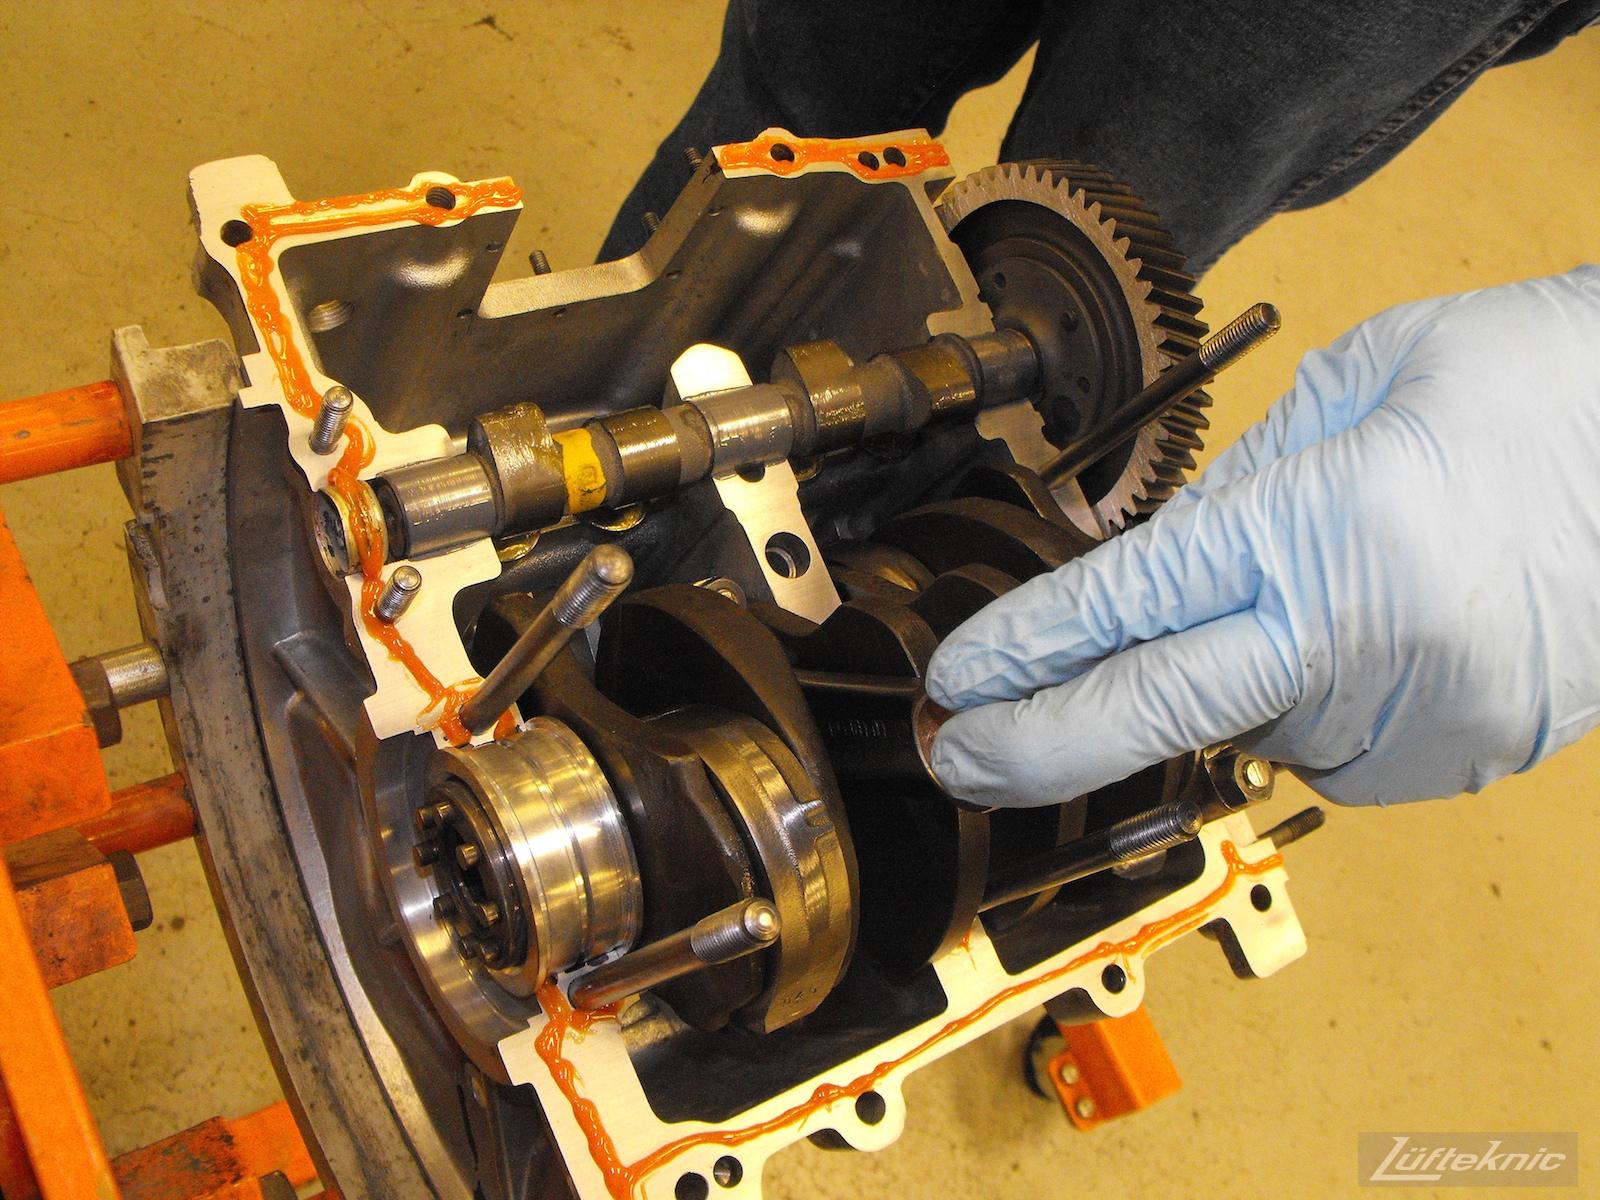 Engine assembly for an Irish Green Porsche 912 undergoing restoration at Lufteknic.